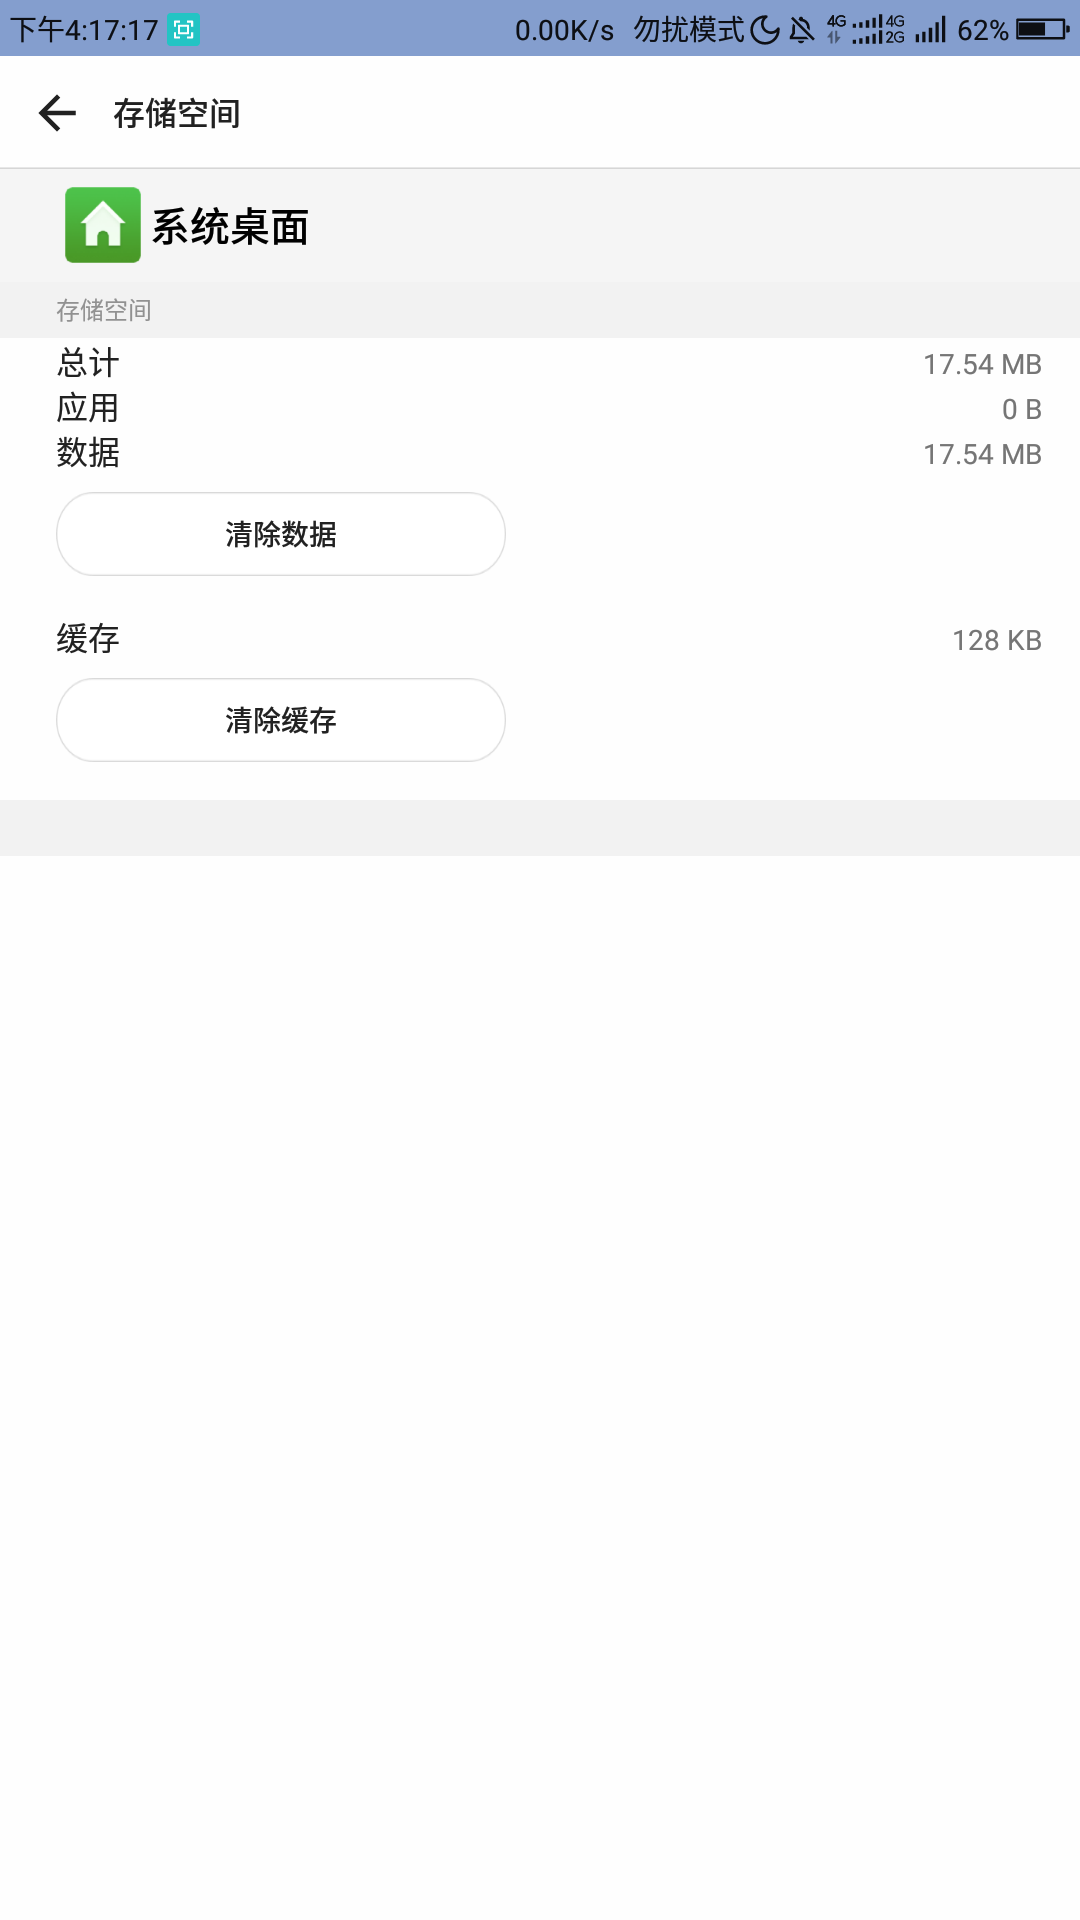 Screenshot_2017-12-20-16-17-19.png